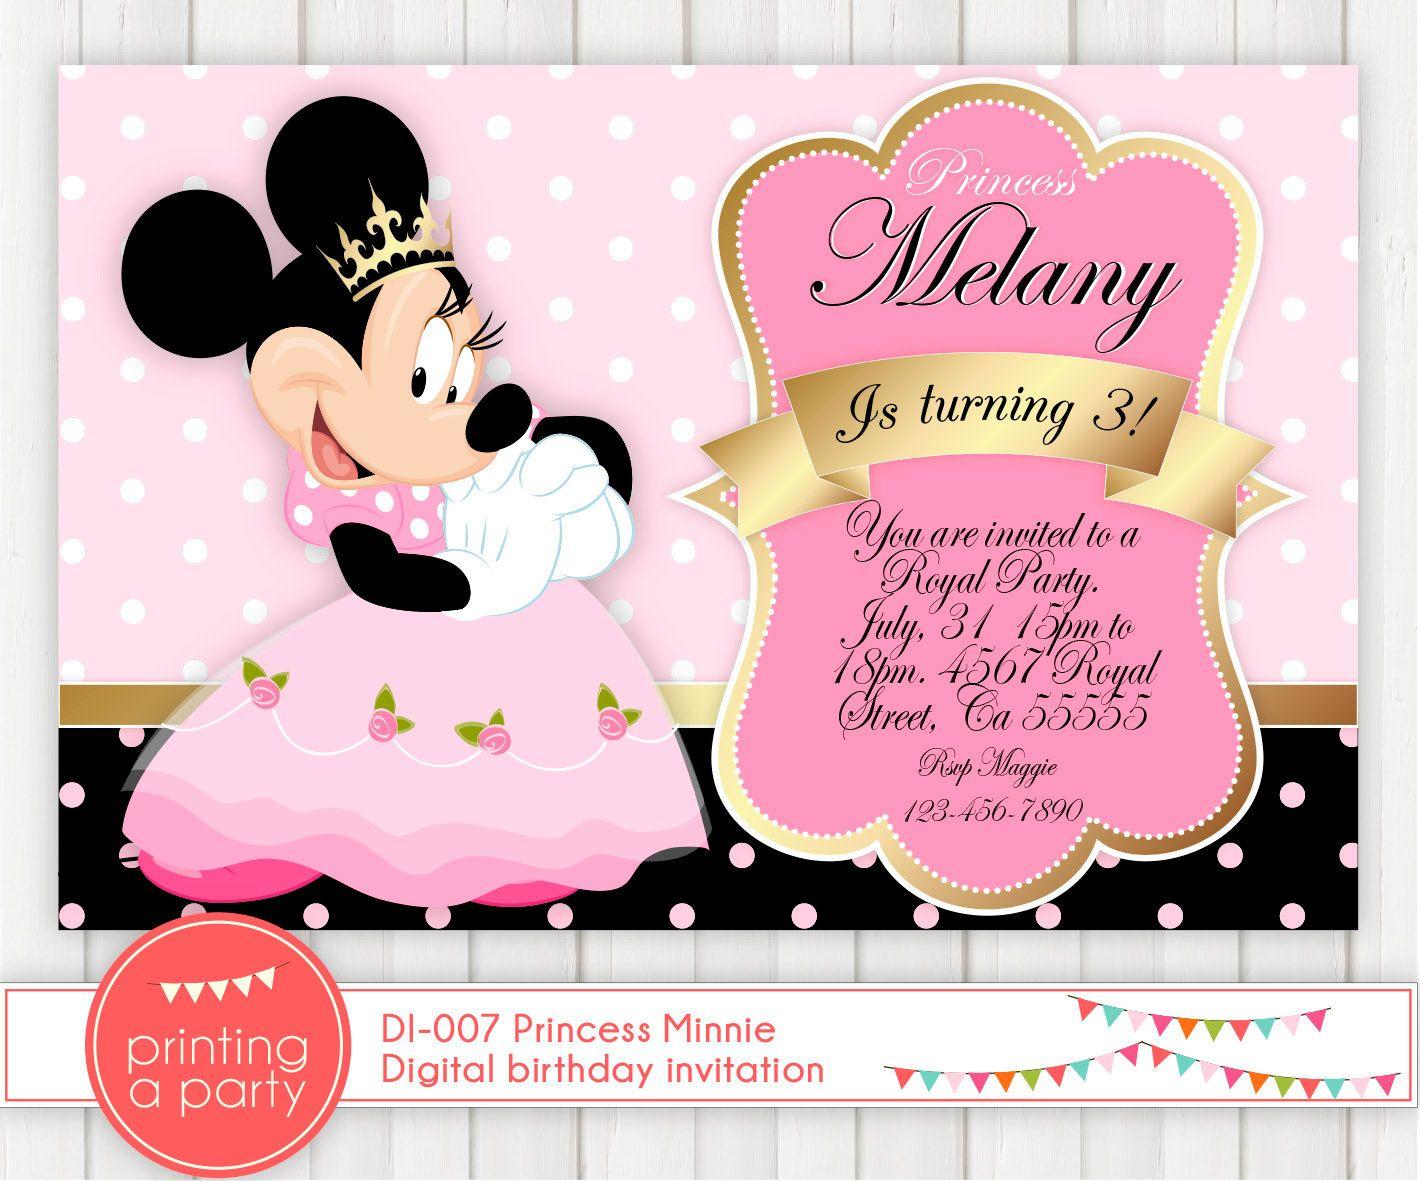 Minnie mouse invitation royal party princess by printingaparty invites pinterest - Princesse minnie ...